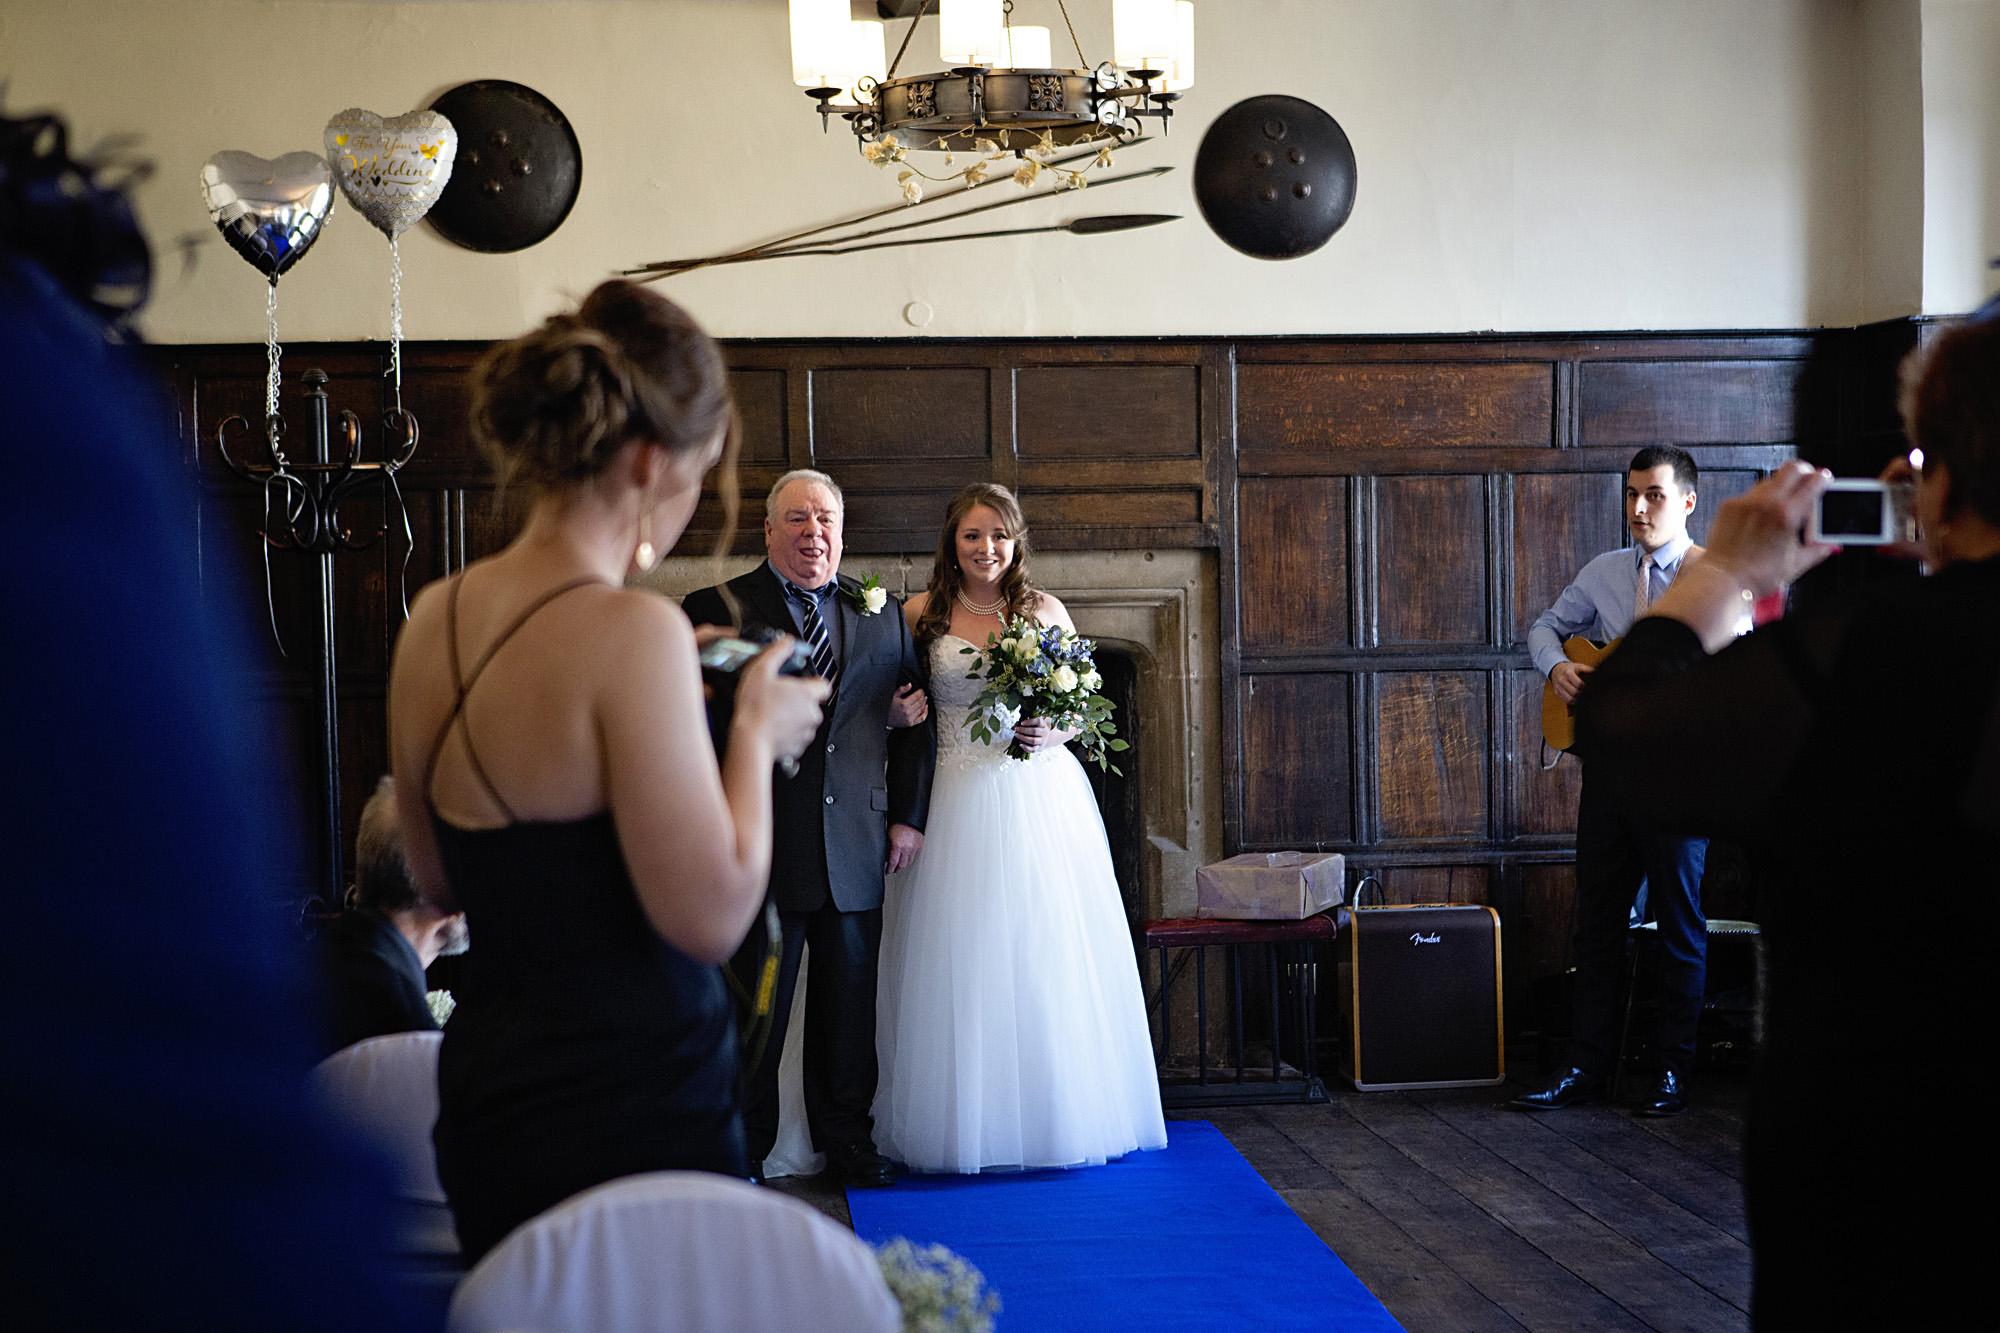 wedding-photos-talbot-hotel-oundle (7).jpg